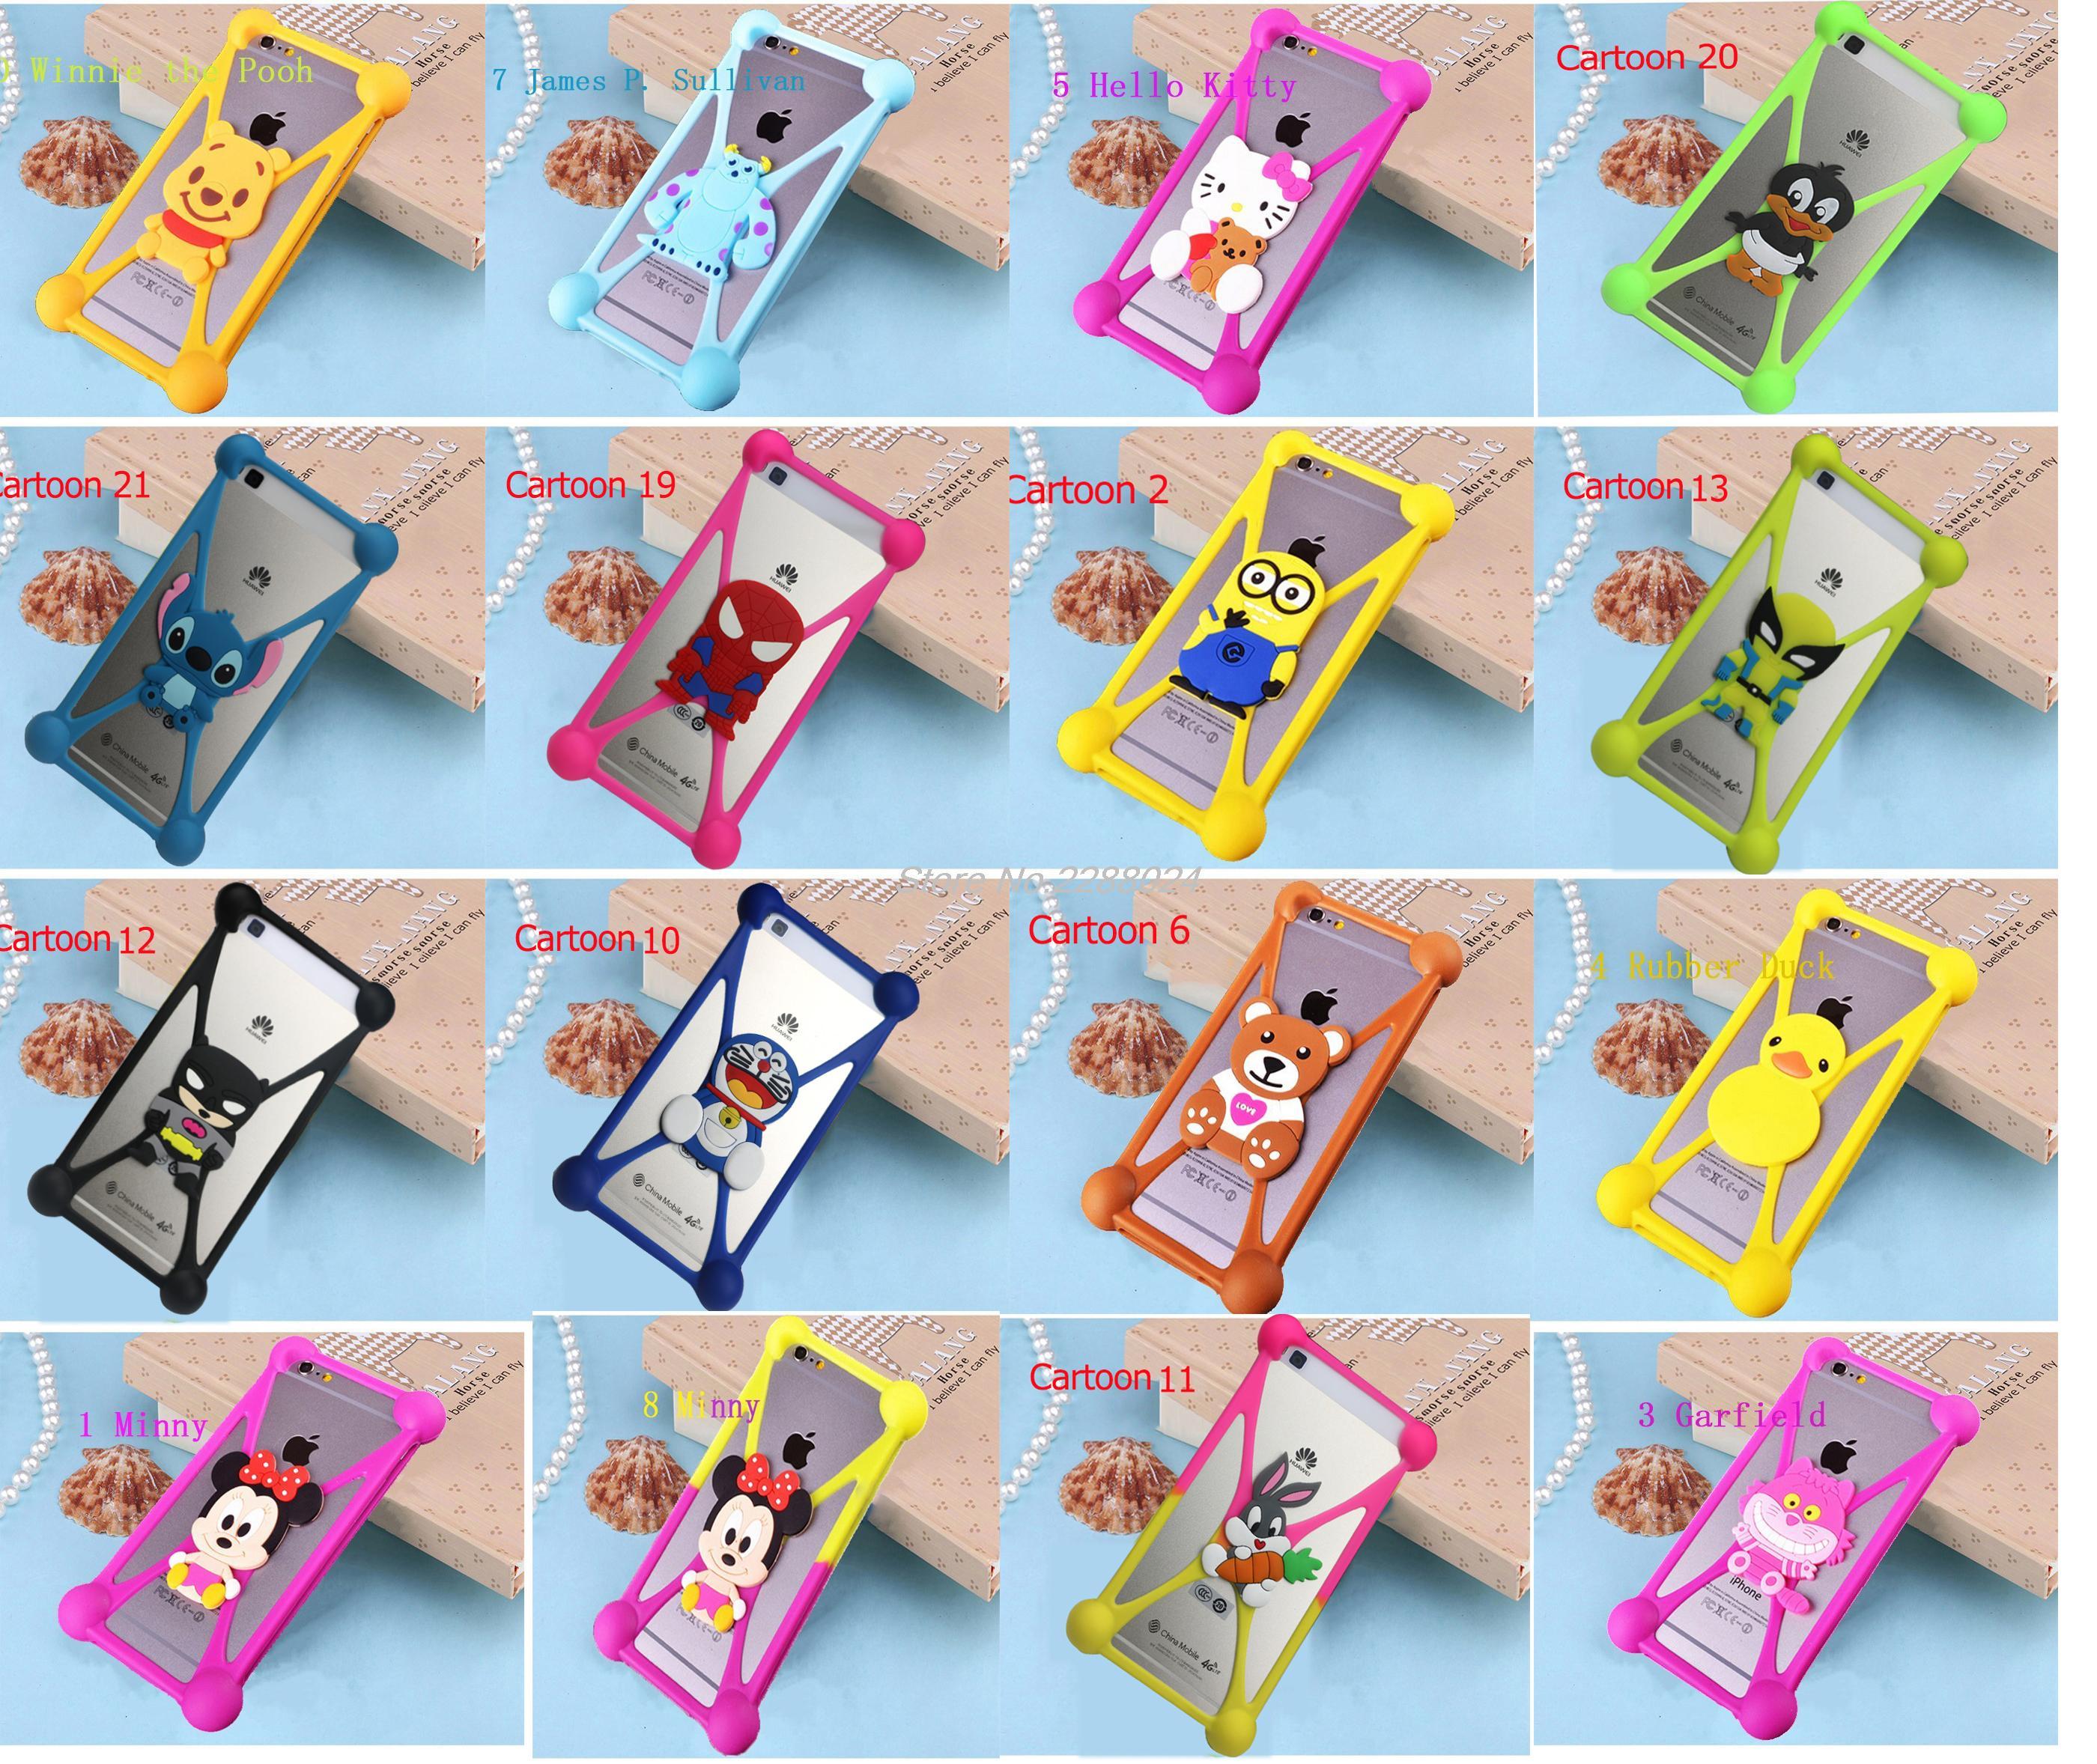 For Nokia Lumia 630 Case 3d Batman Stitch Minnie Tiger Silicone Silikon Xiaomiredmi3s Minions Bear Phone Rubber 520 610 620 625